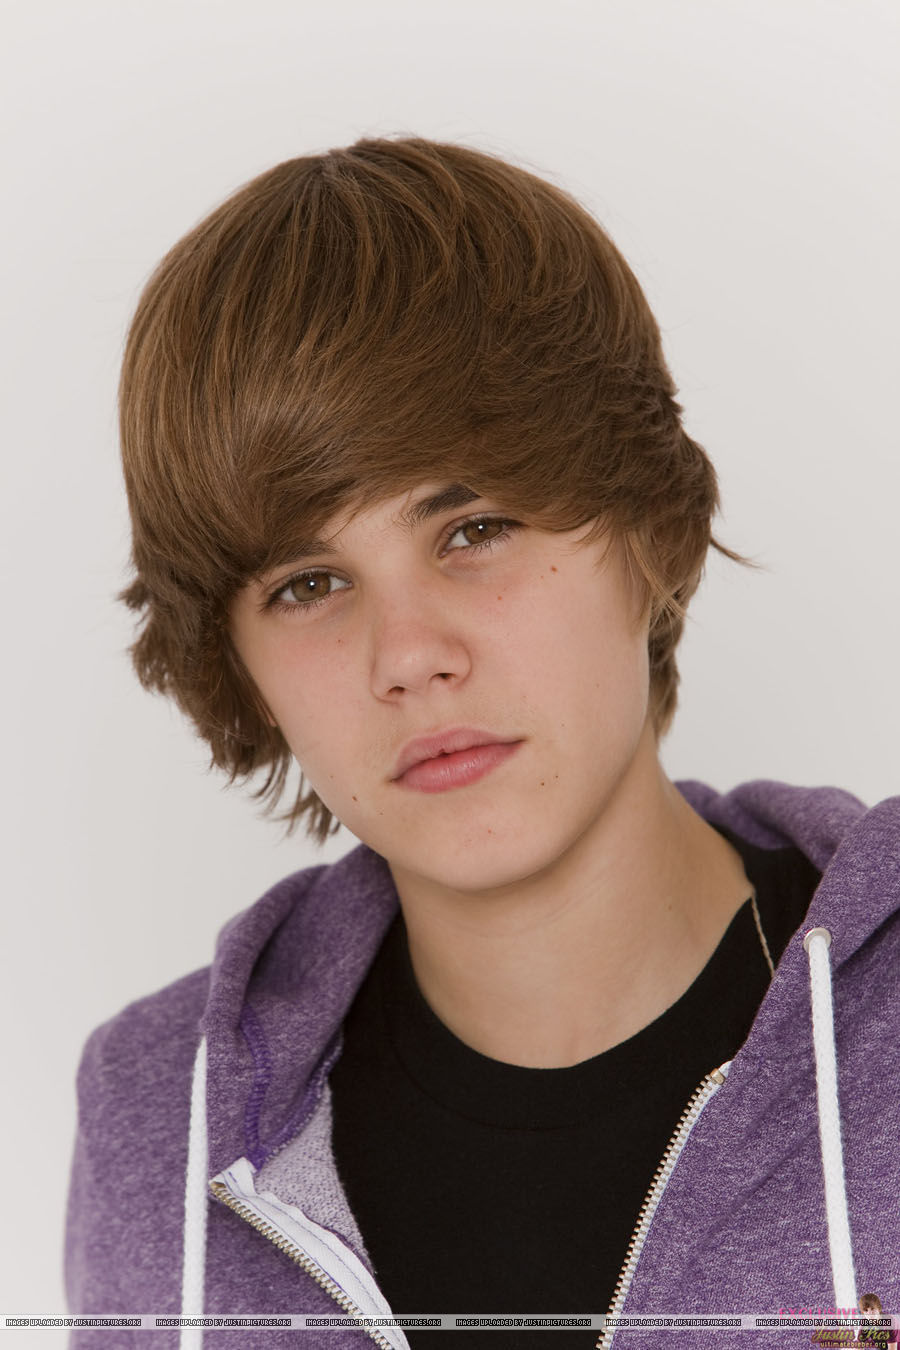 Beliebers: Justin Bieber: The Dome Photoshoot джастин бибер фильм